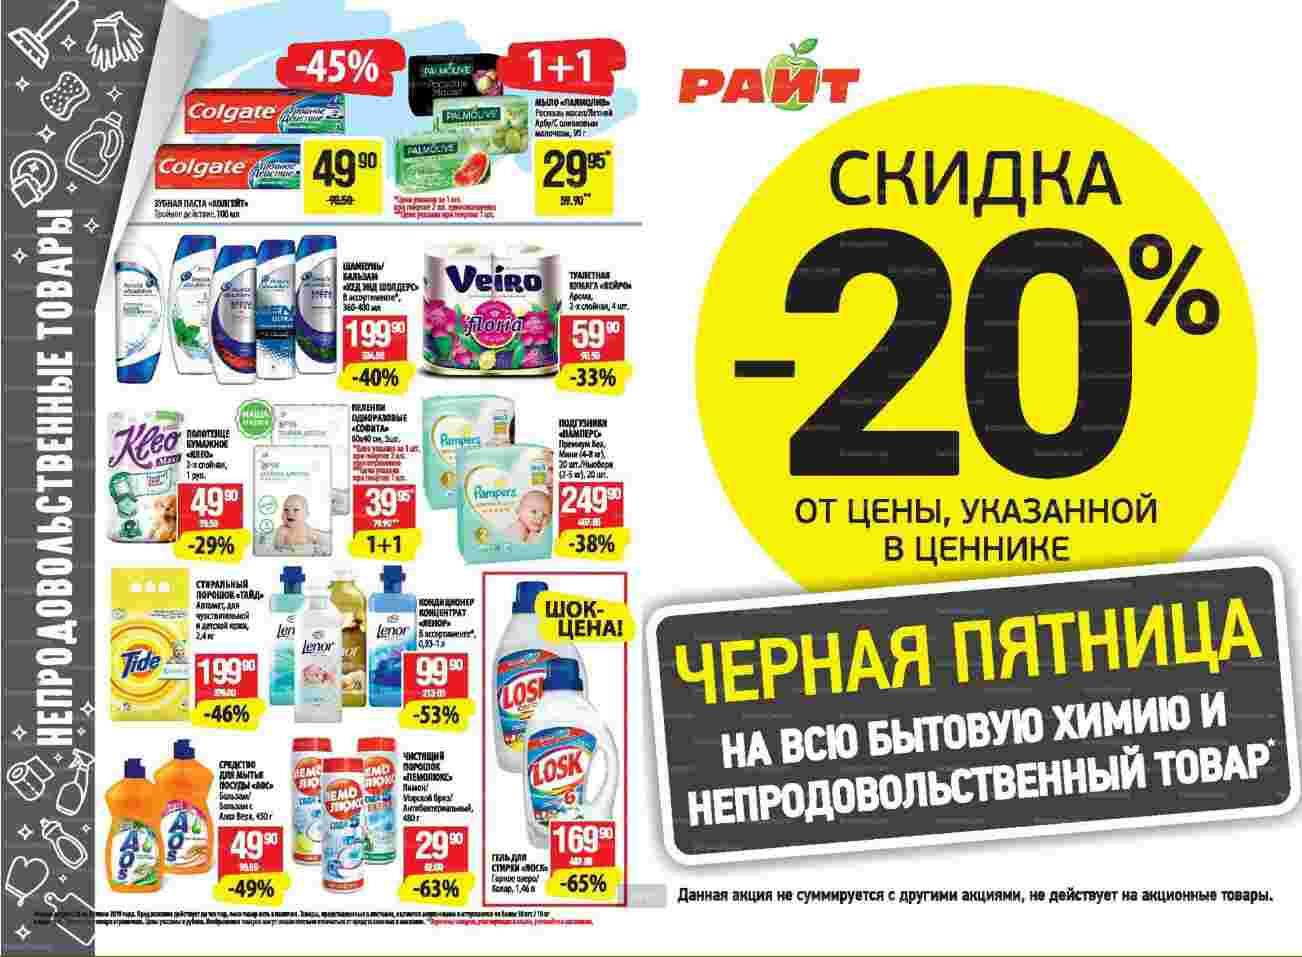 Каталог гипермаркетов РАЙТ 10-16.06.2019 стр.10